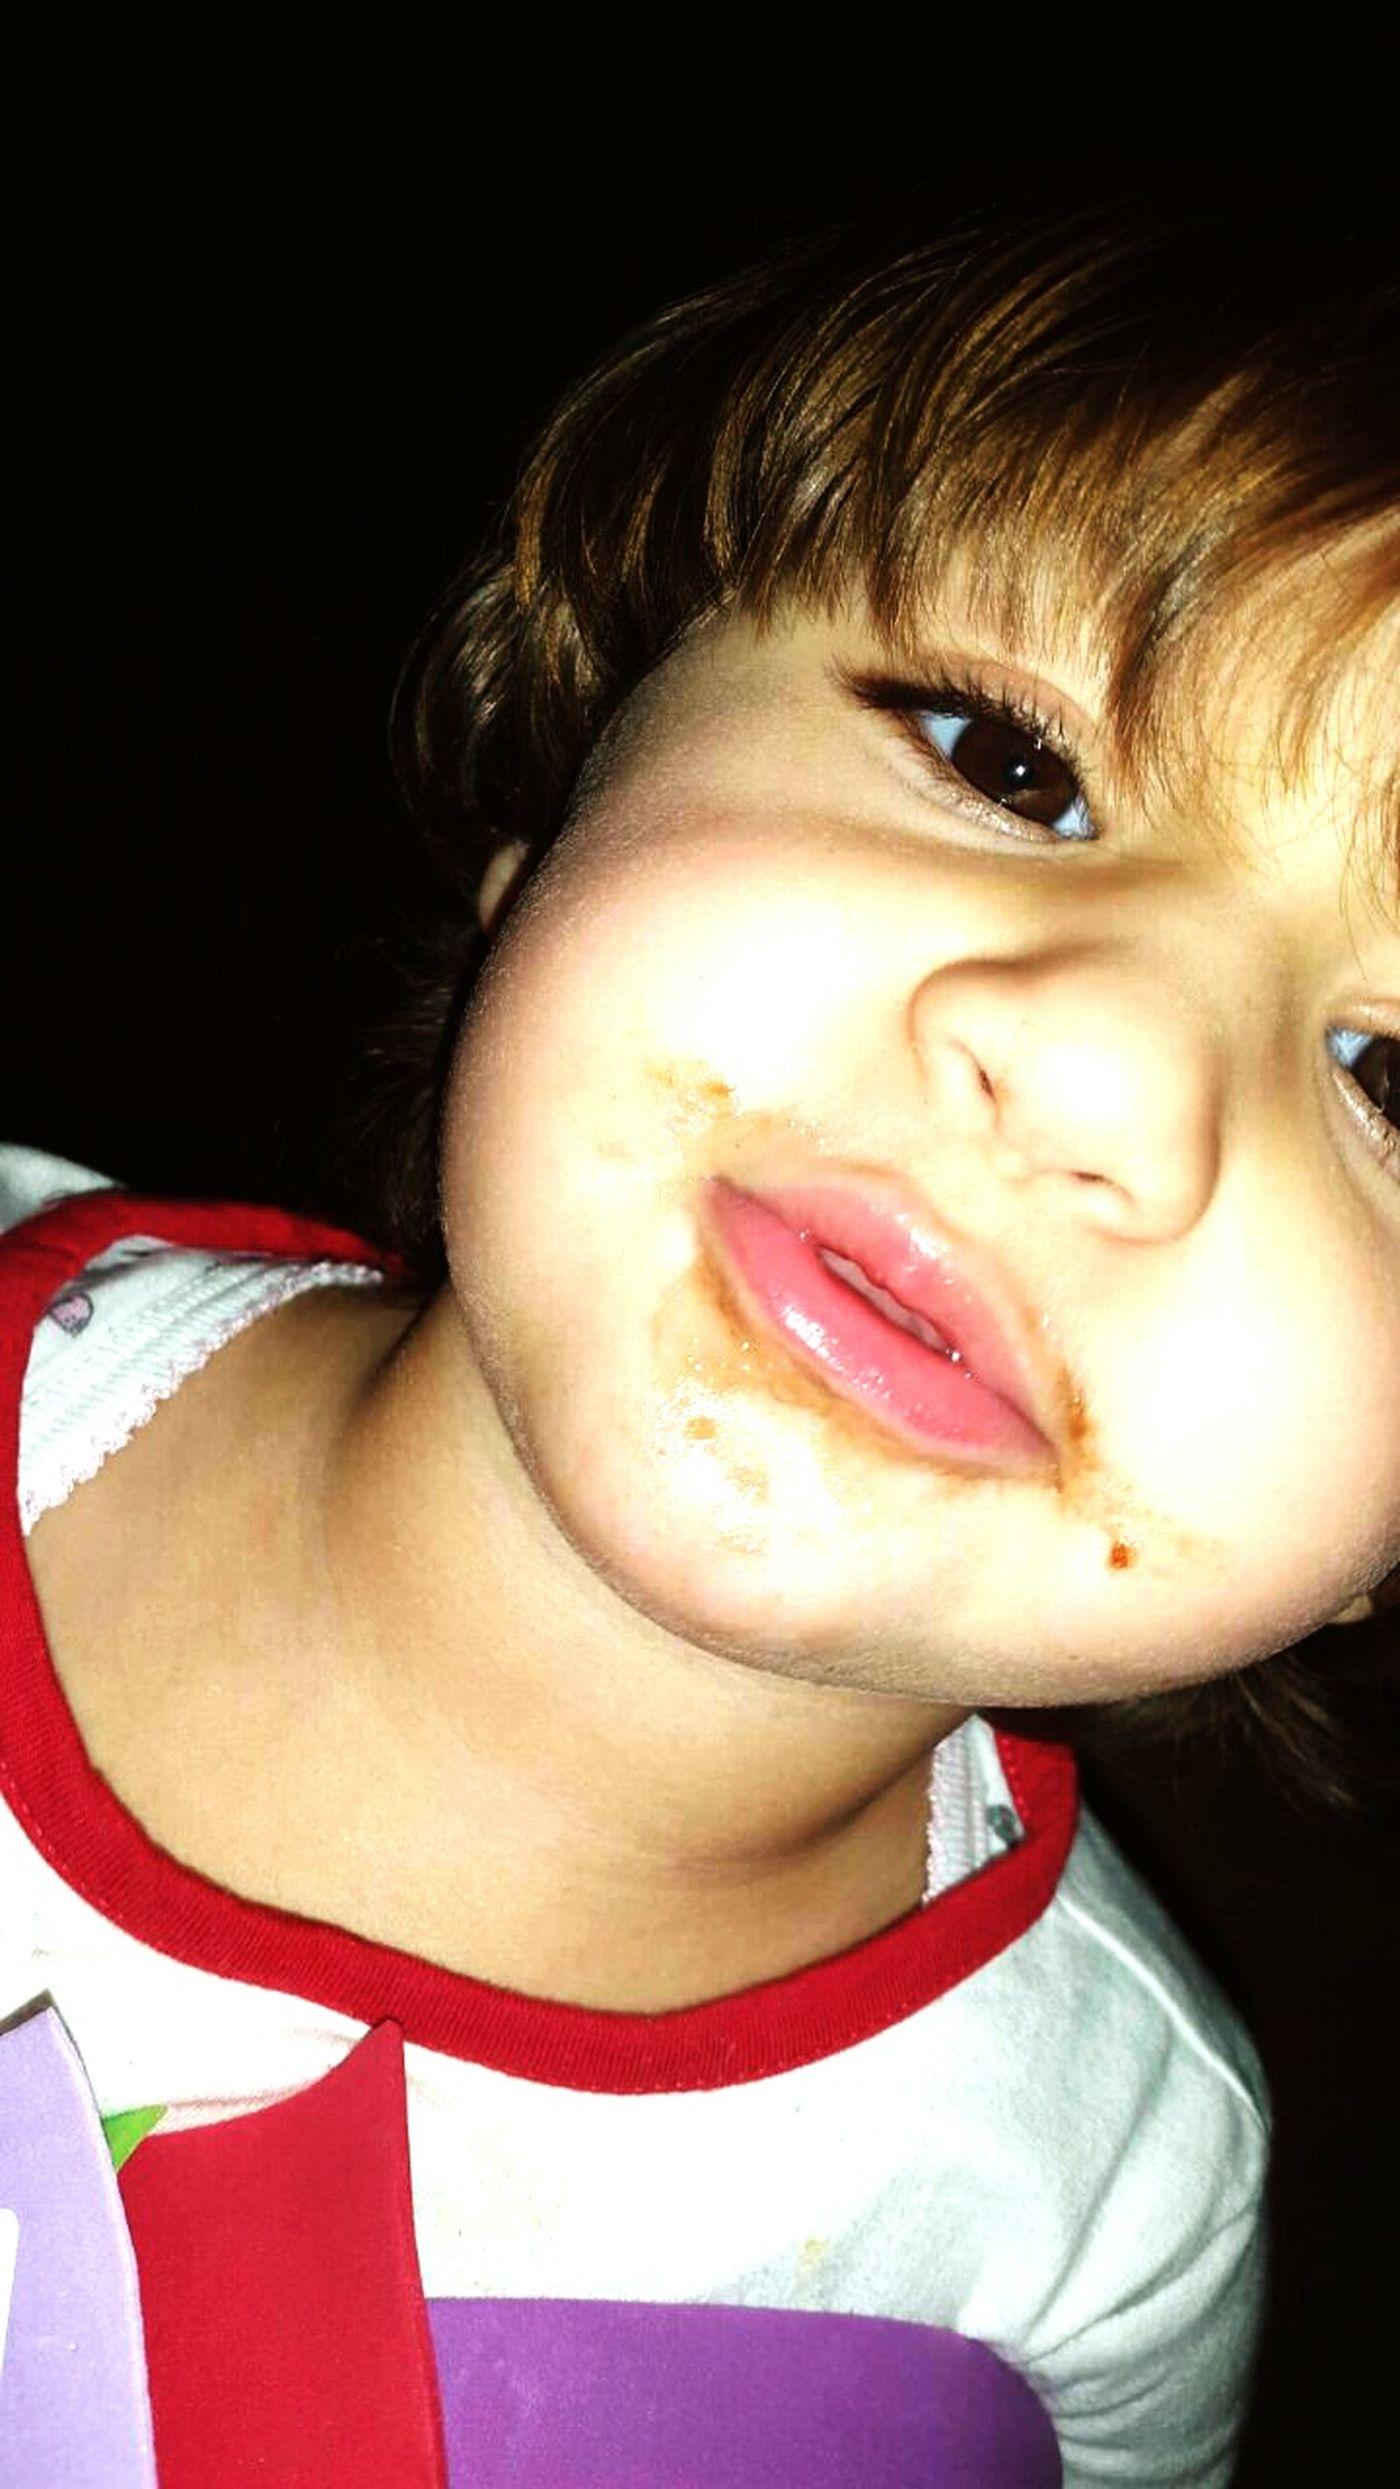 Cute Baby Kid Eating Chocolate Chocolate Kiss